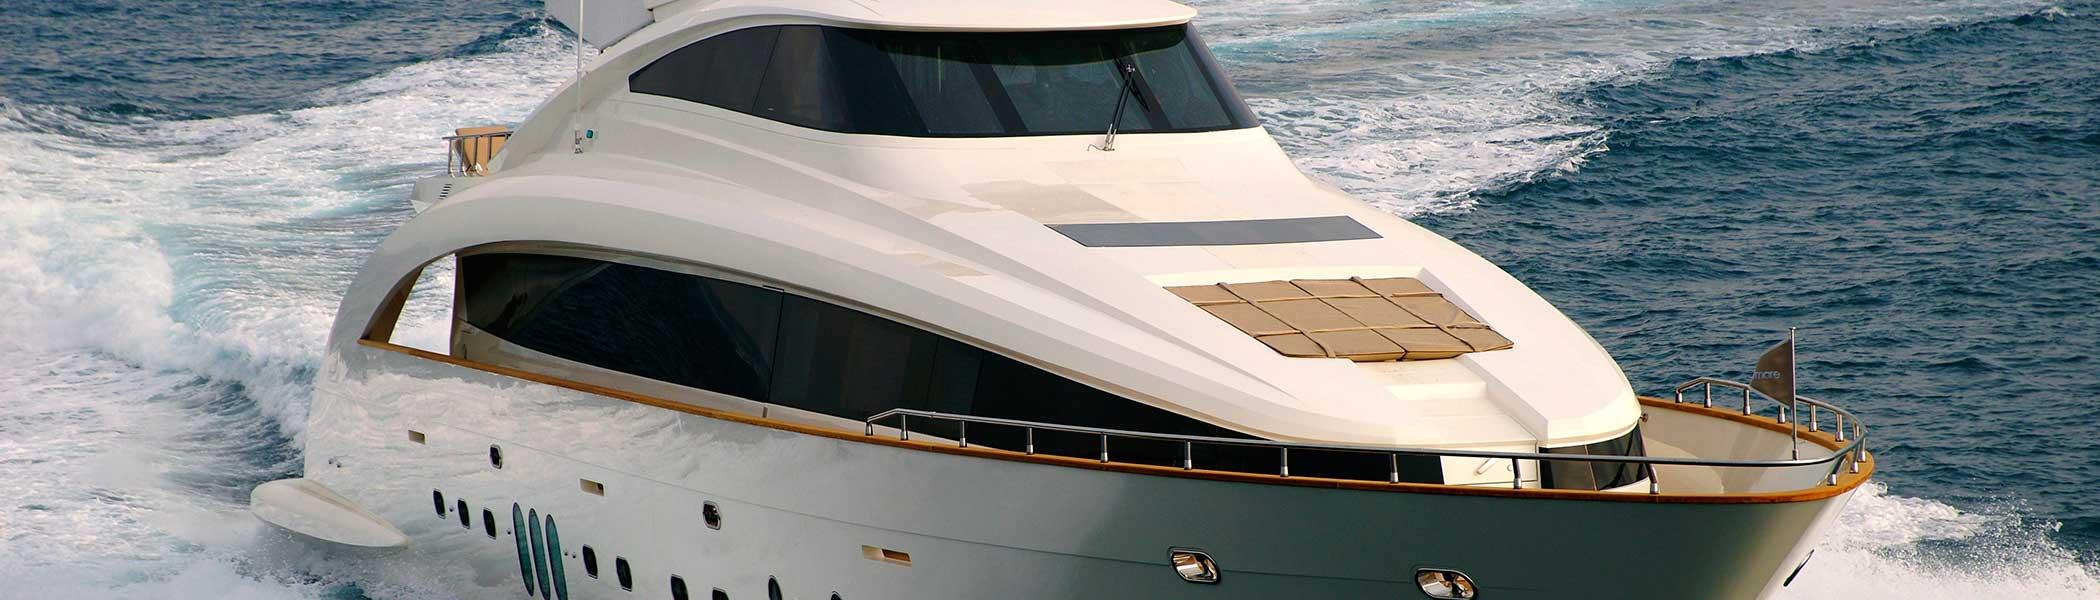 Amer Yachts - Amer 116 a116-4